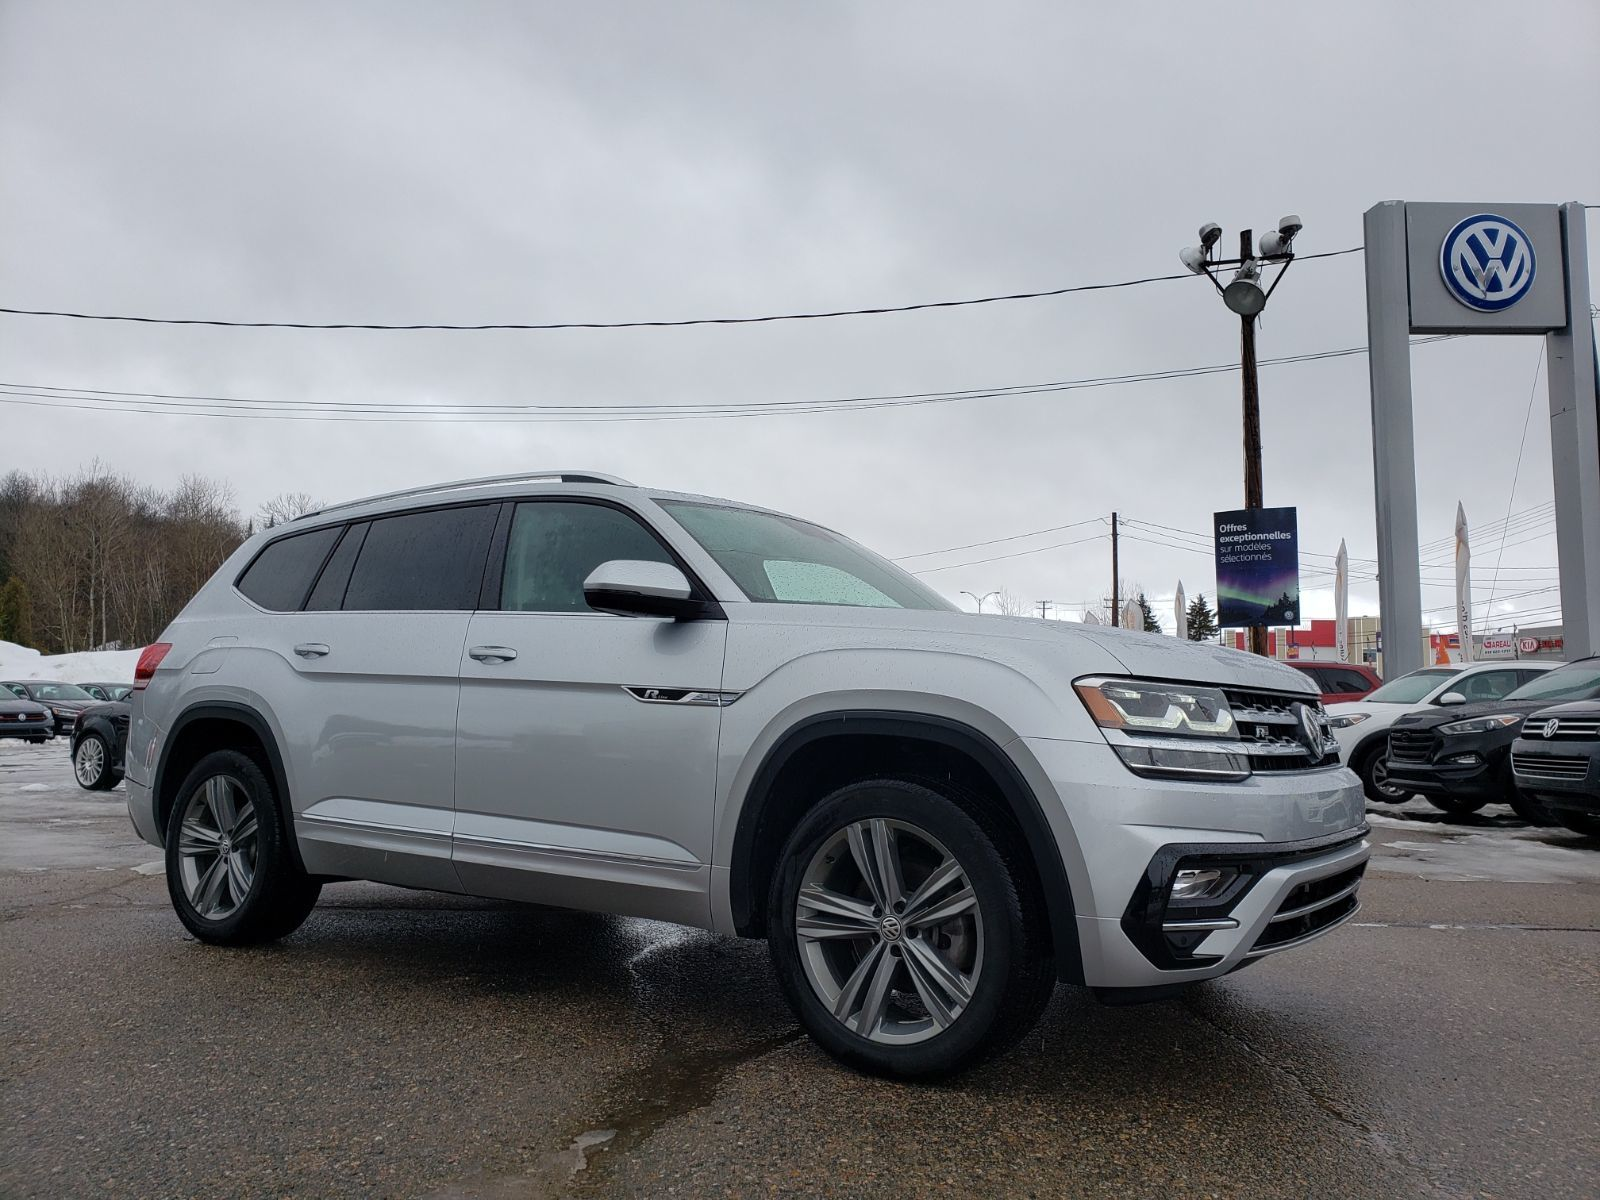 Used 2018 Volkswagen Atlas Highline Demo V6 3 6l R Line Silver 12 450 Km For Sale 39995 0 Leblanc Vw 2411